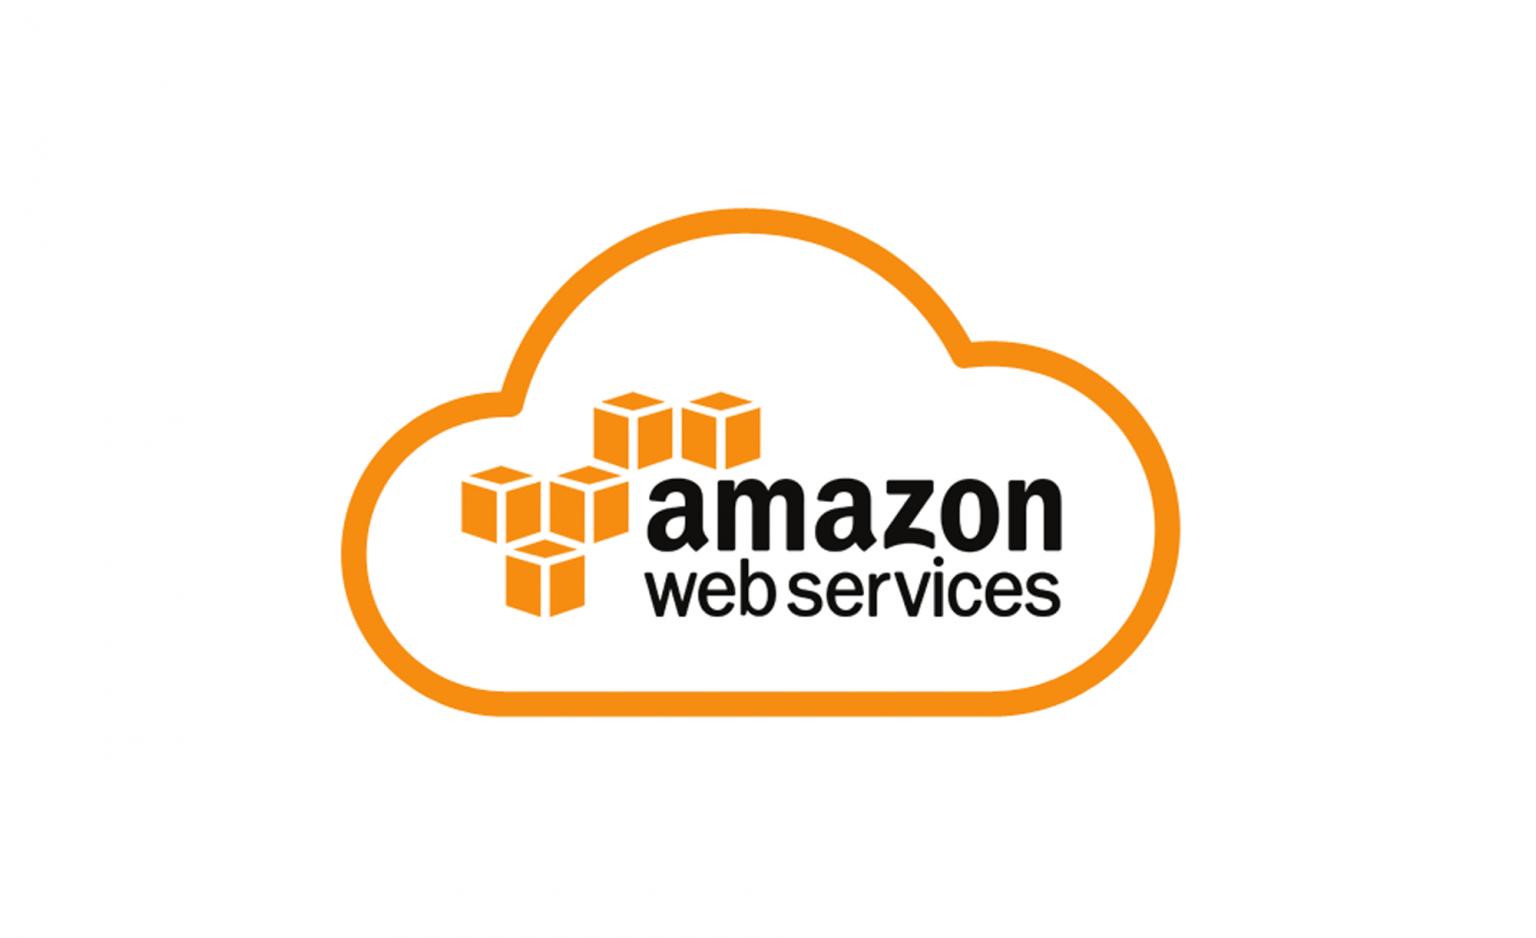 AWS- RBL Bank's cloud provider | AWS- RBL चा क्लाउड प्रदाता_40.1